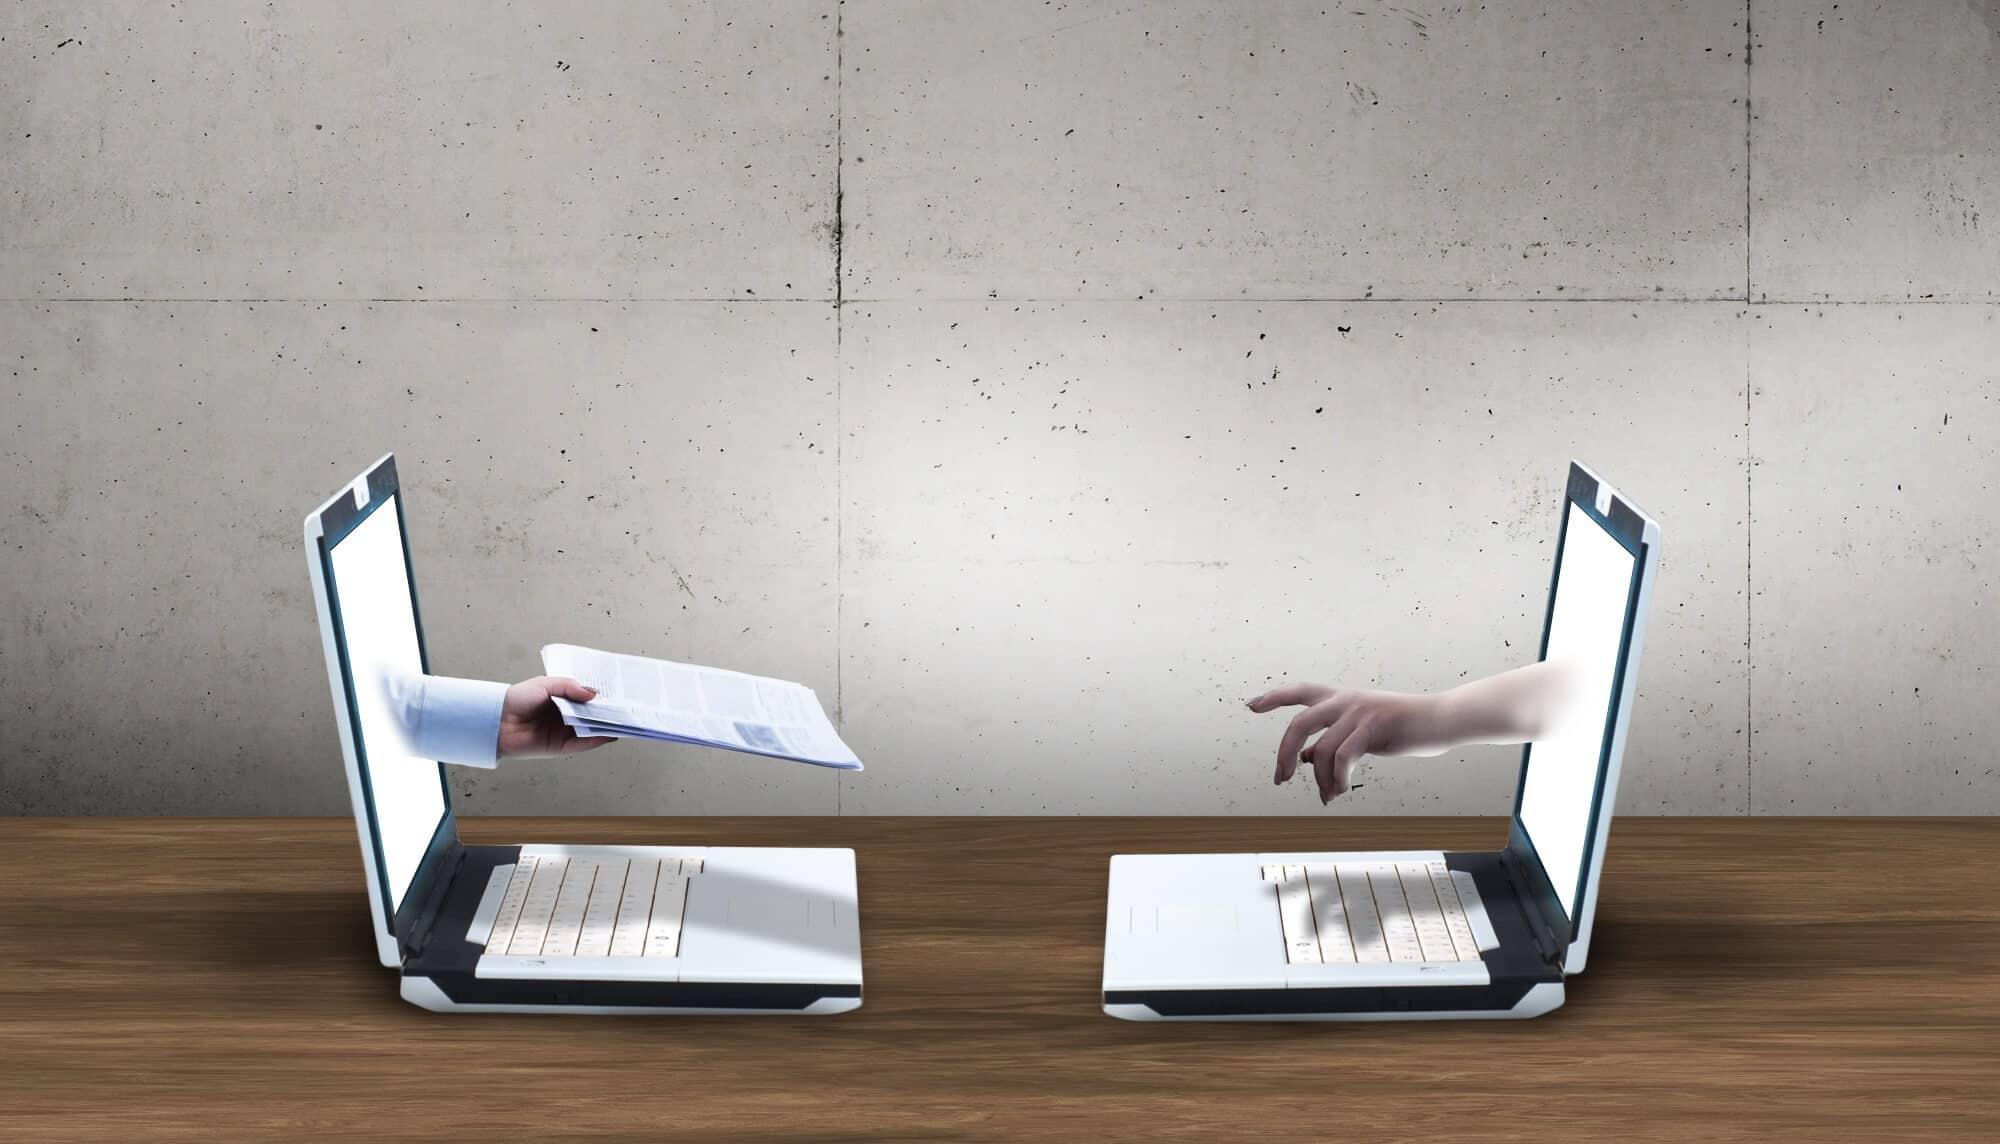 Datenschutz bei Online-Bewerbungen